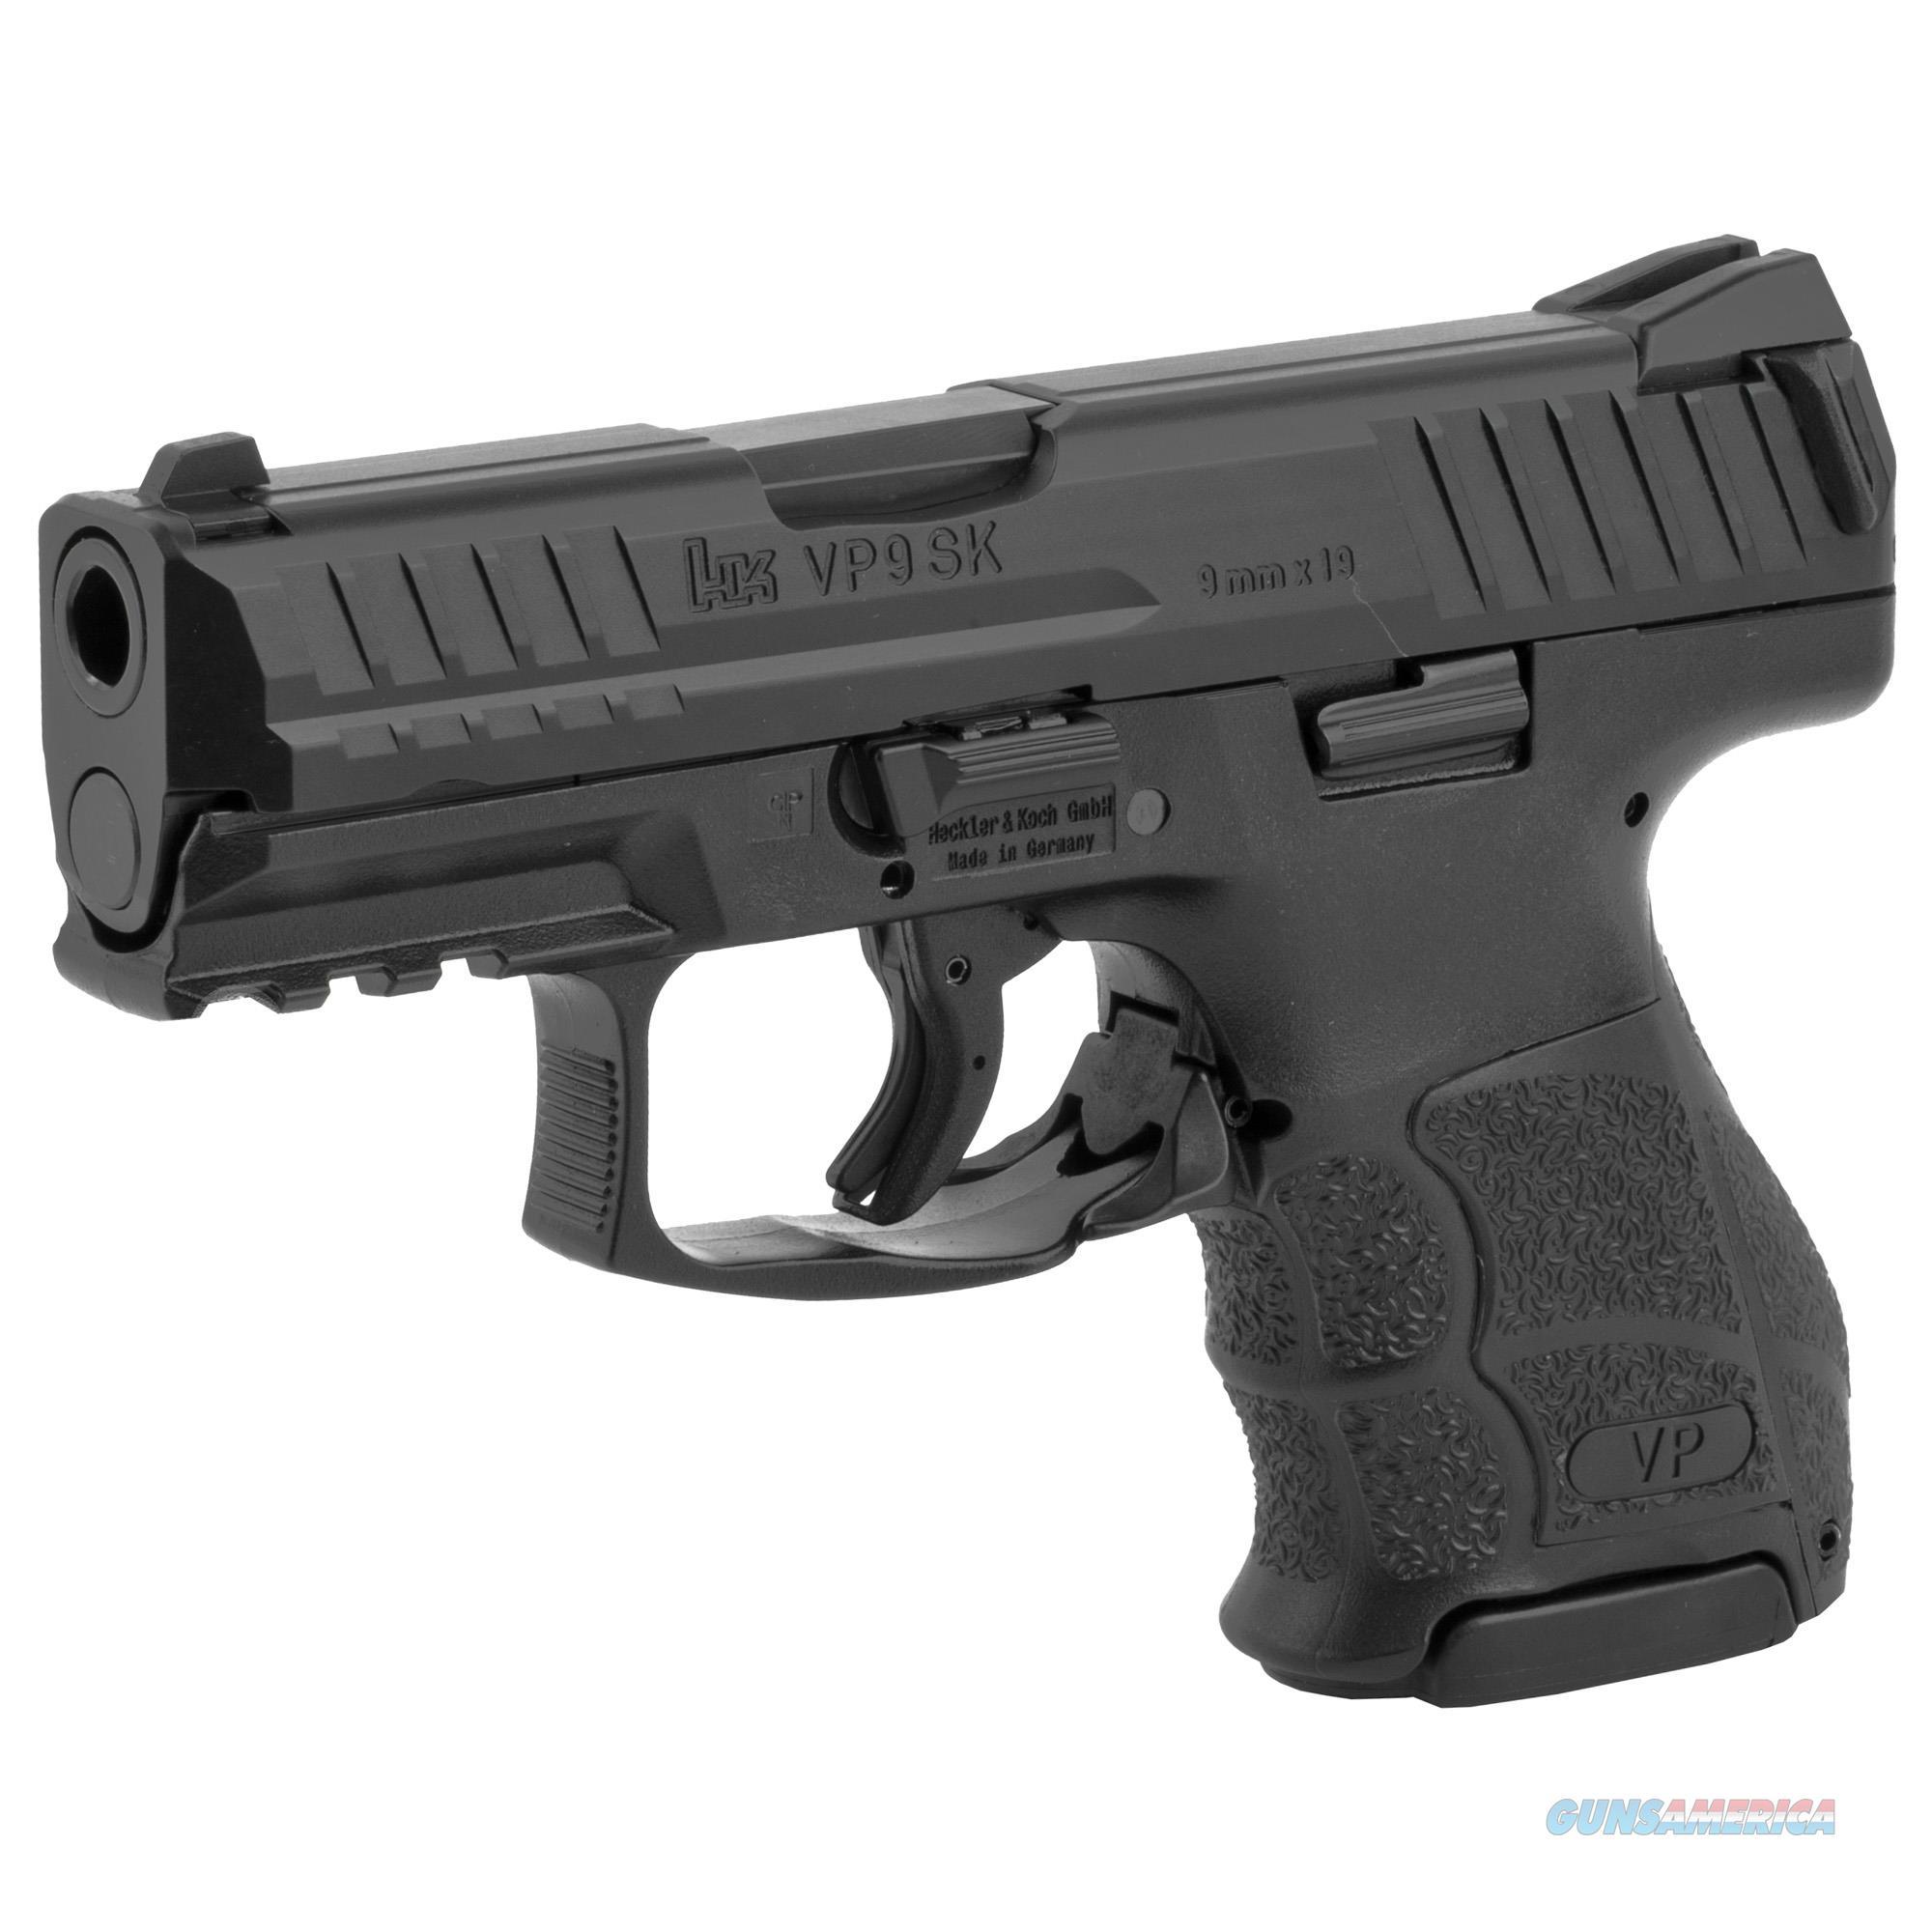 "HK VP9 SK 9mm3.39"" 10+1 - New in Case  Guns > Pistols > Heckler & Koch Pistols > Polymer Frame"